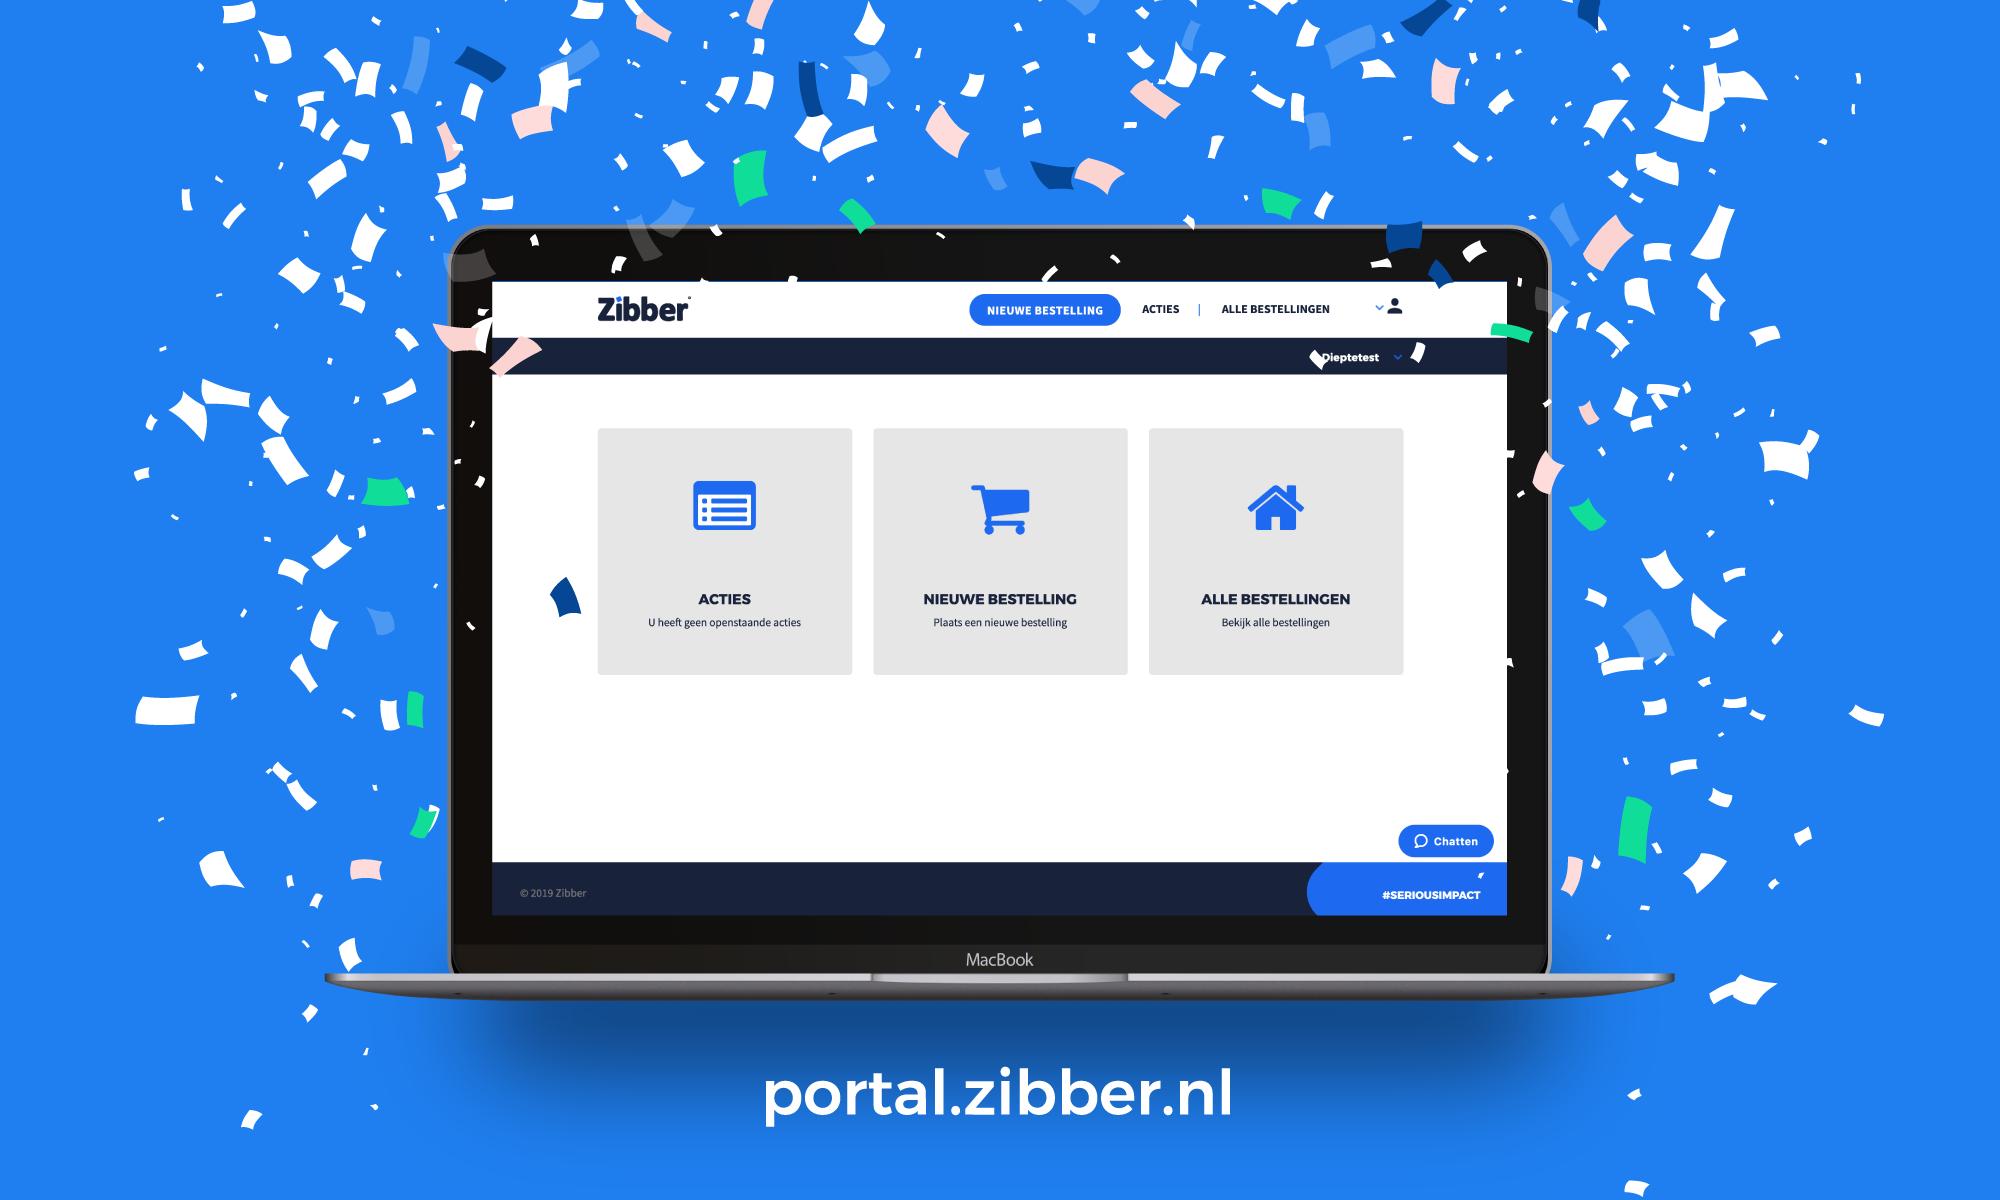 Portal Zibber